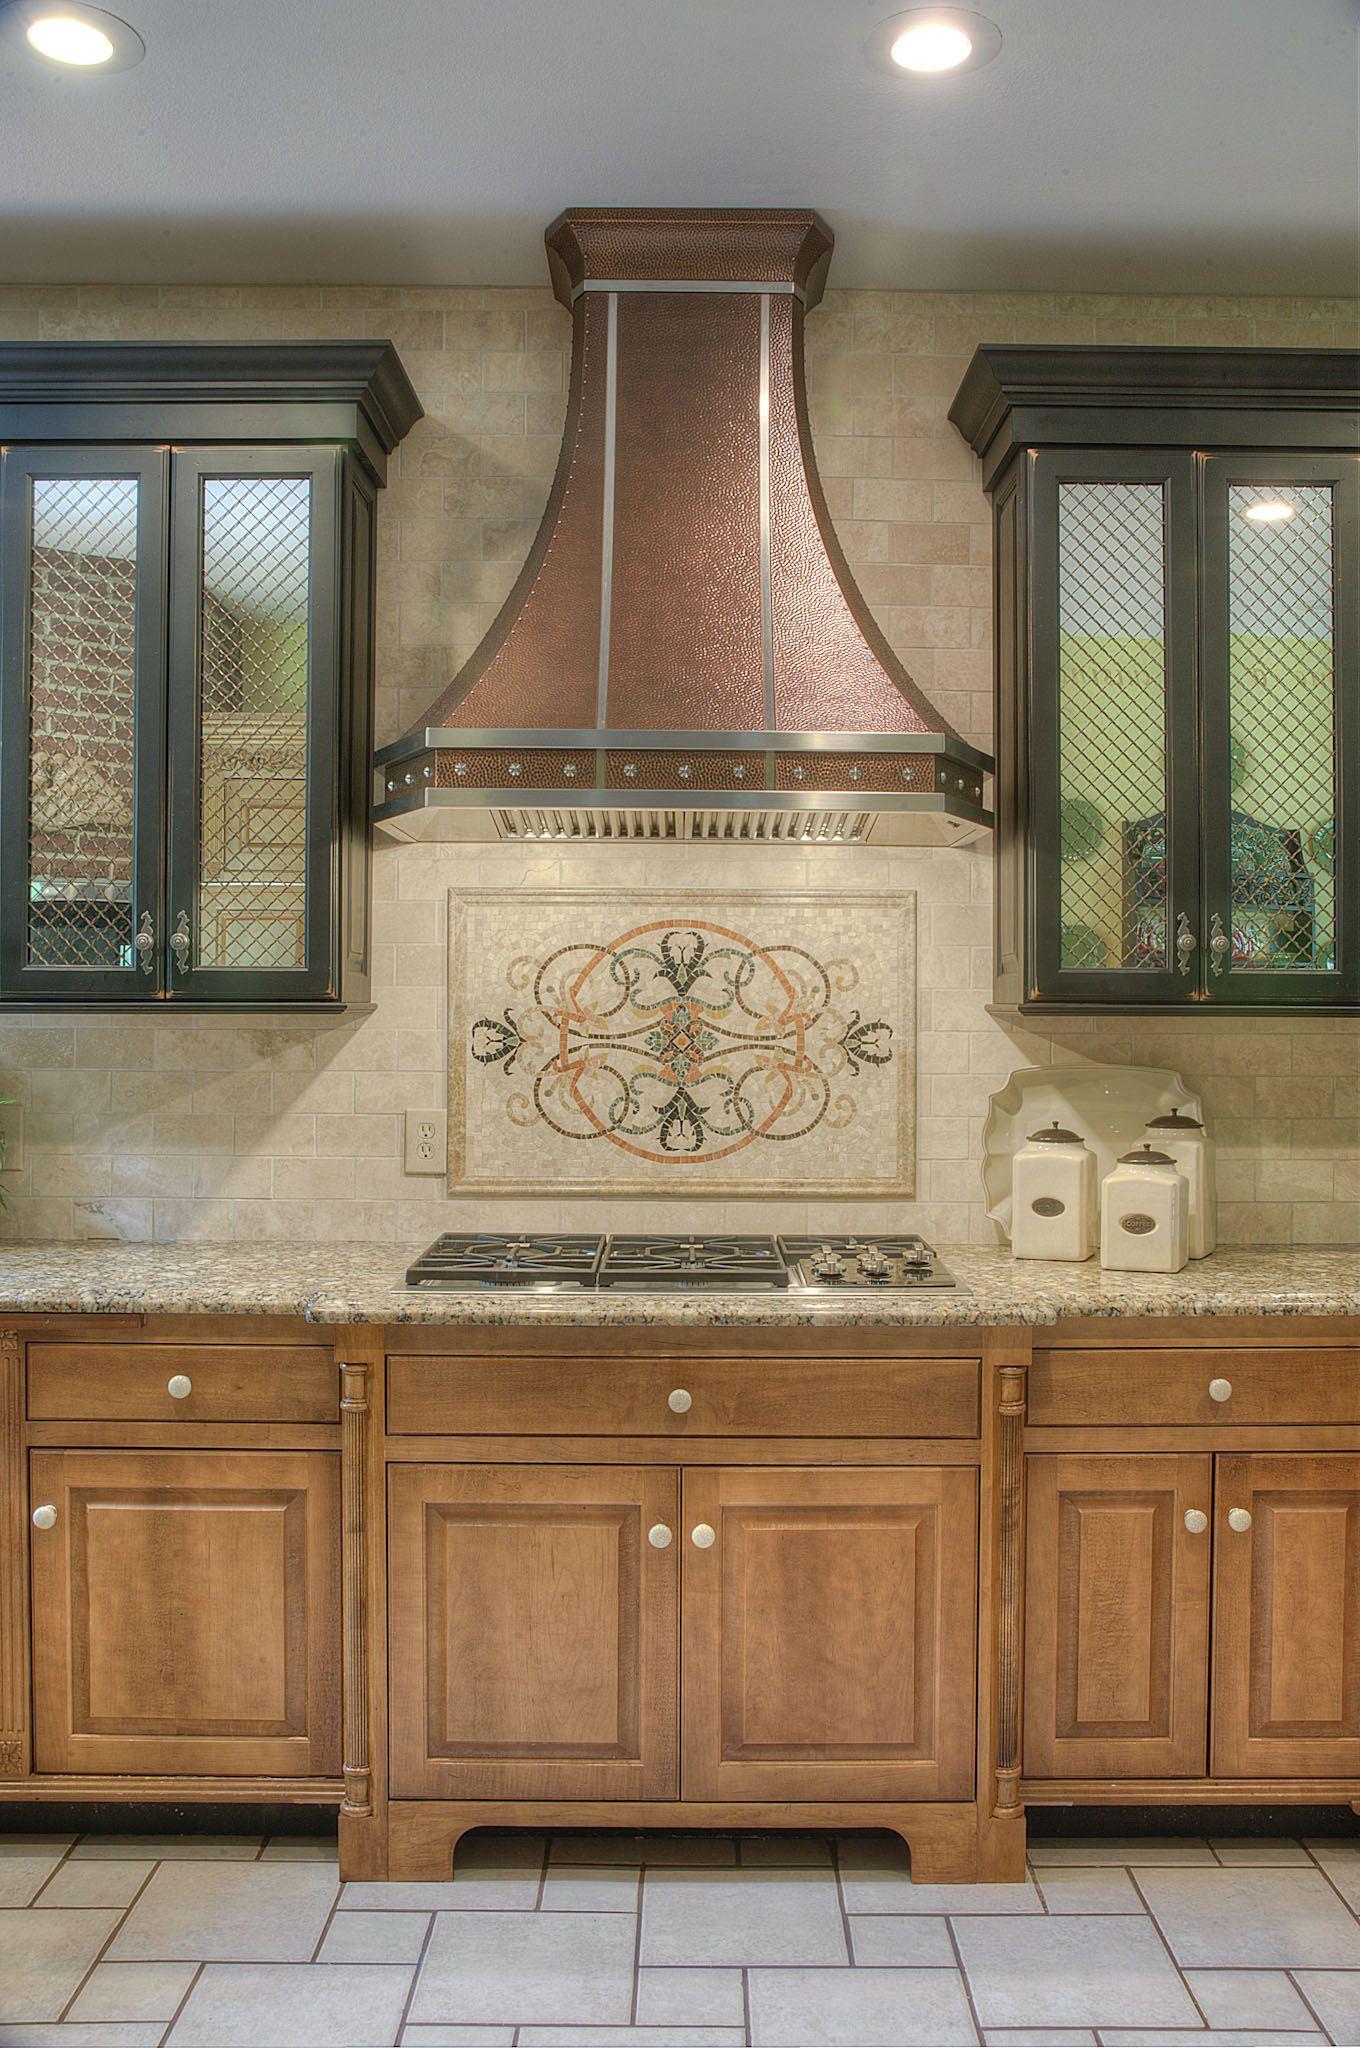 Kitchen Hood Designs Ideas Part - 19: Kitchen Hood Exhaust Duct Velocity For Kitchen Vent